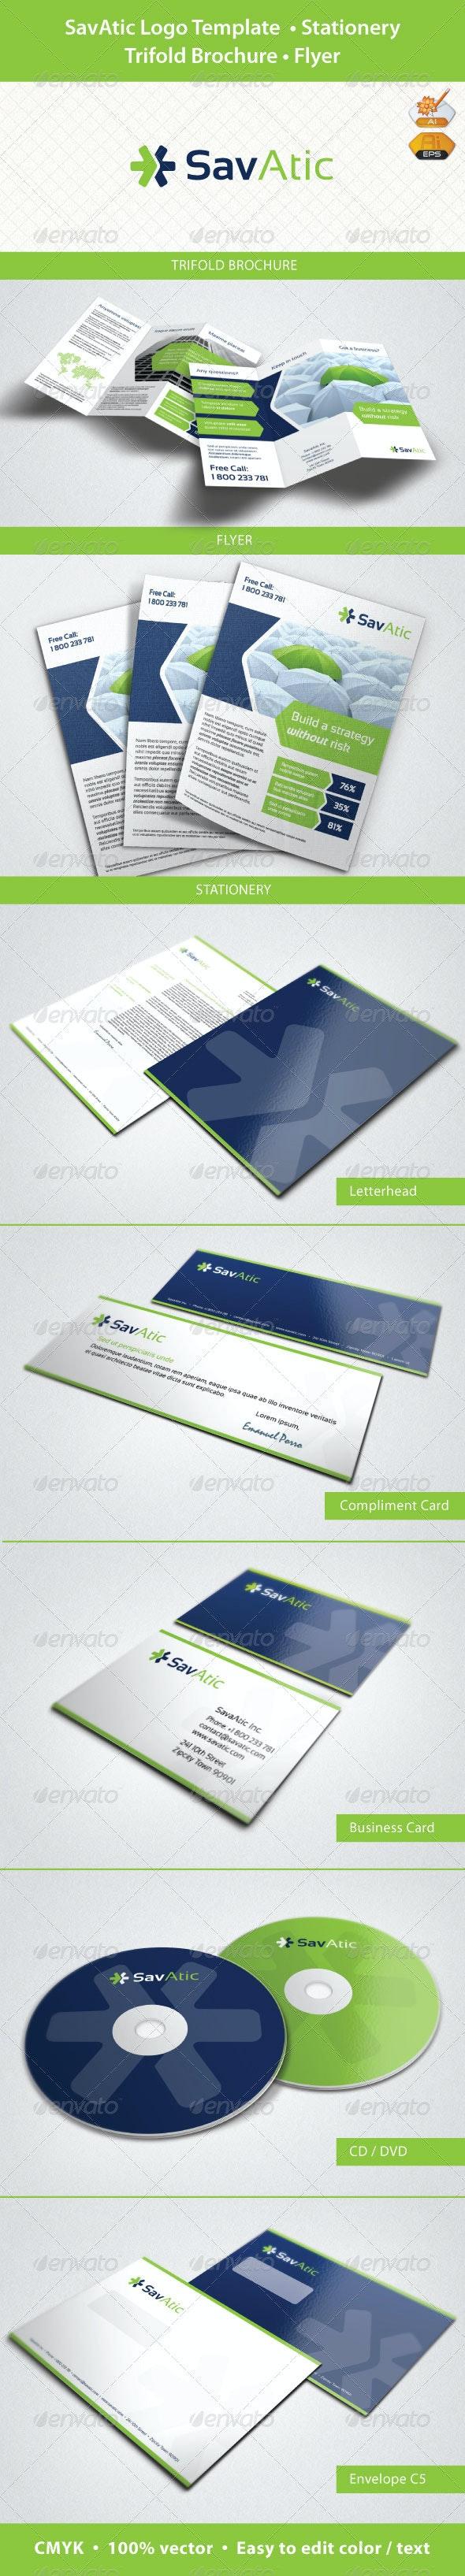 SavAtic Logo, Stationery, Trifold Brochure, Flyer - Stationery Print Templates